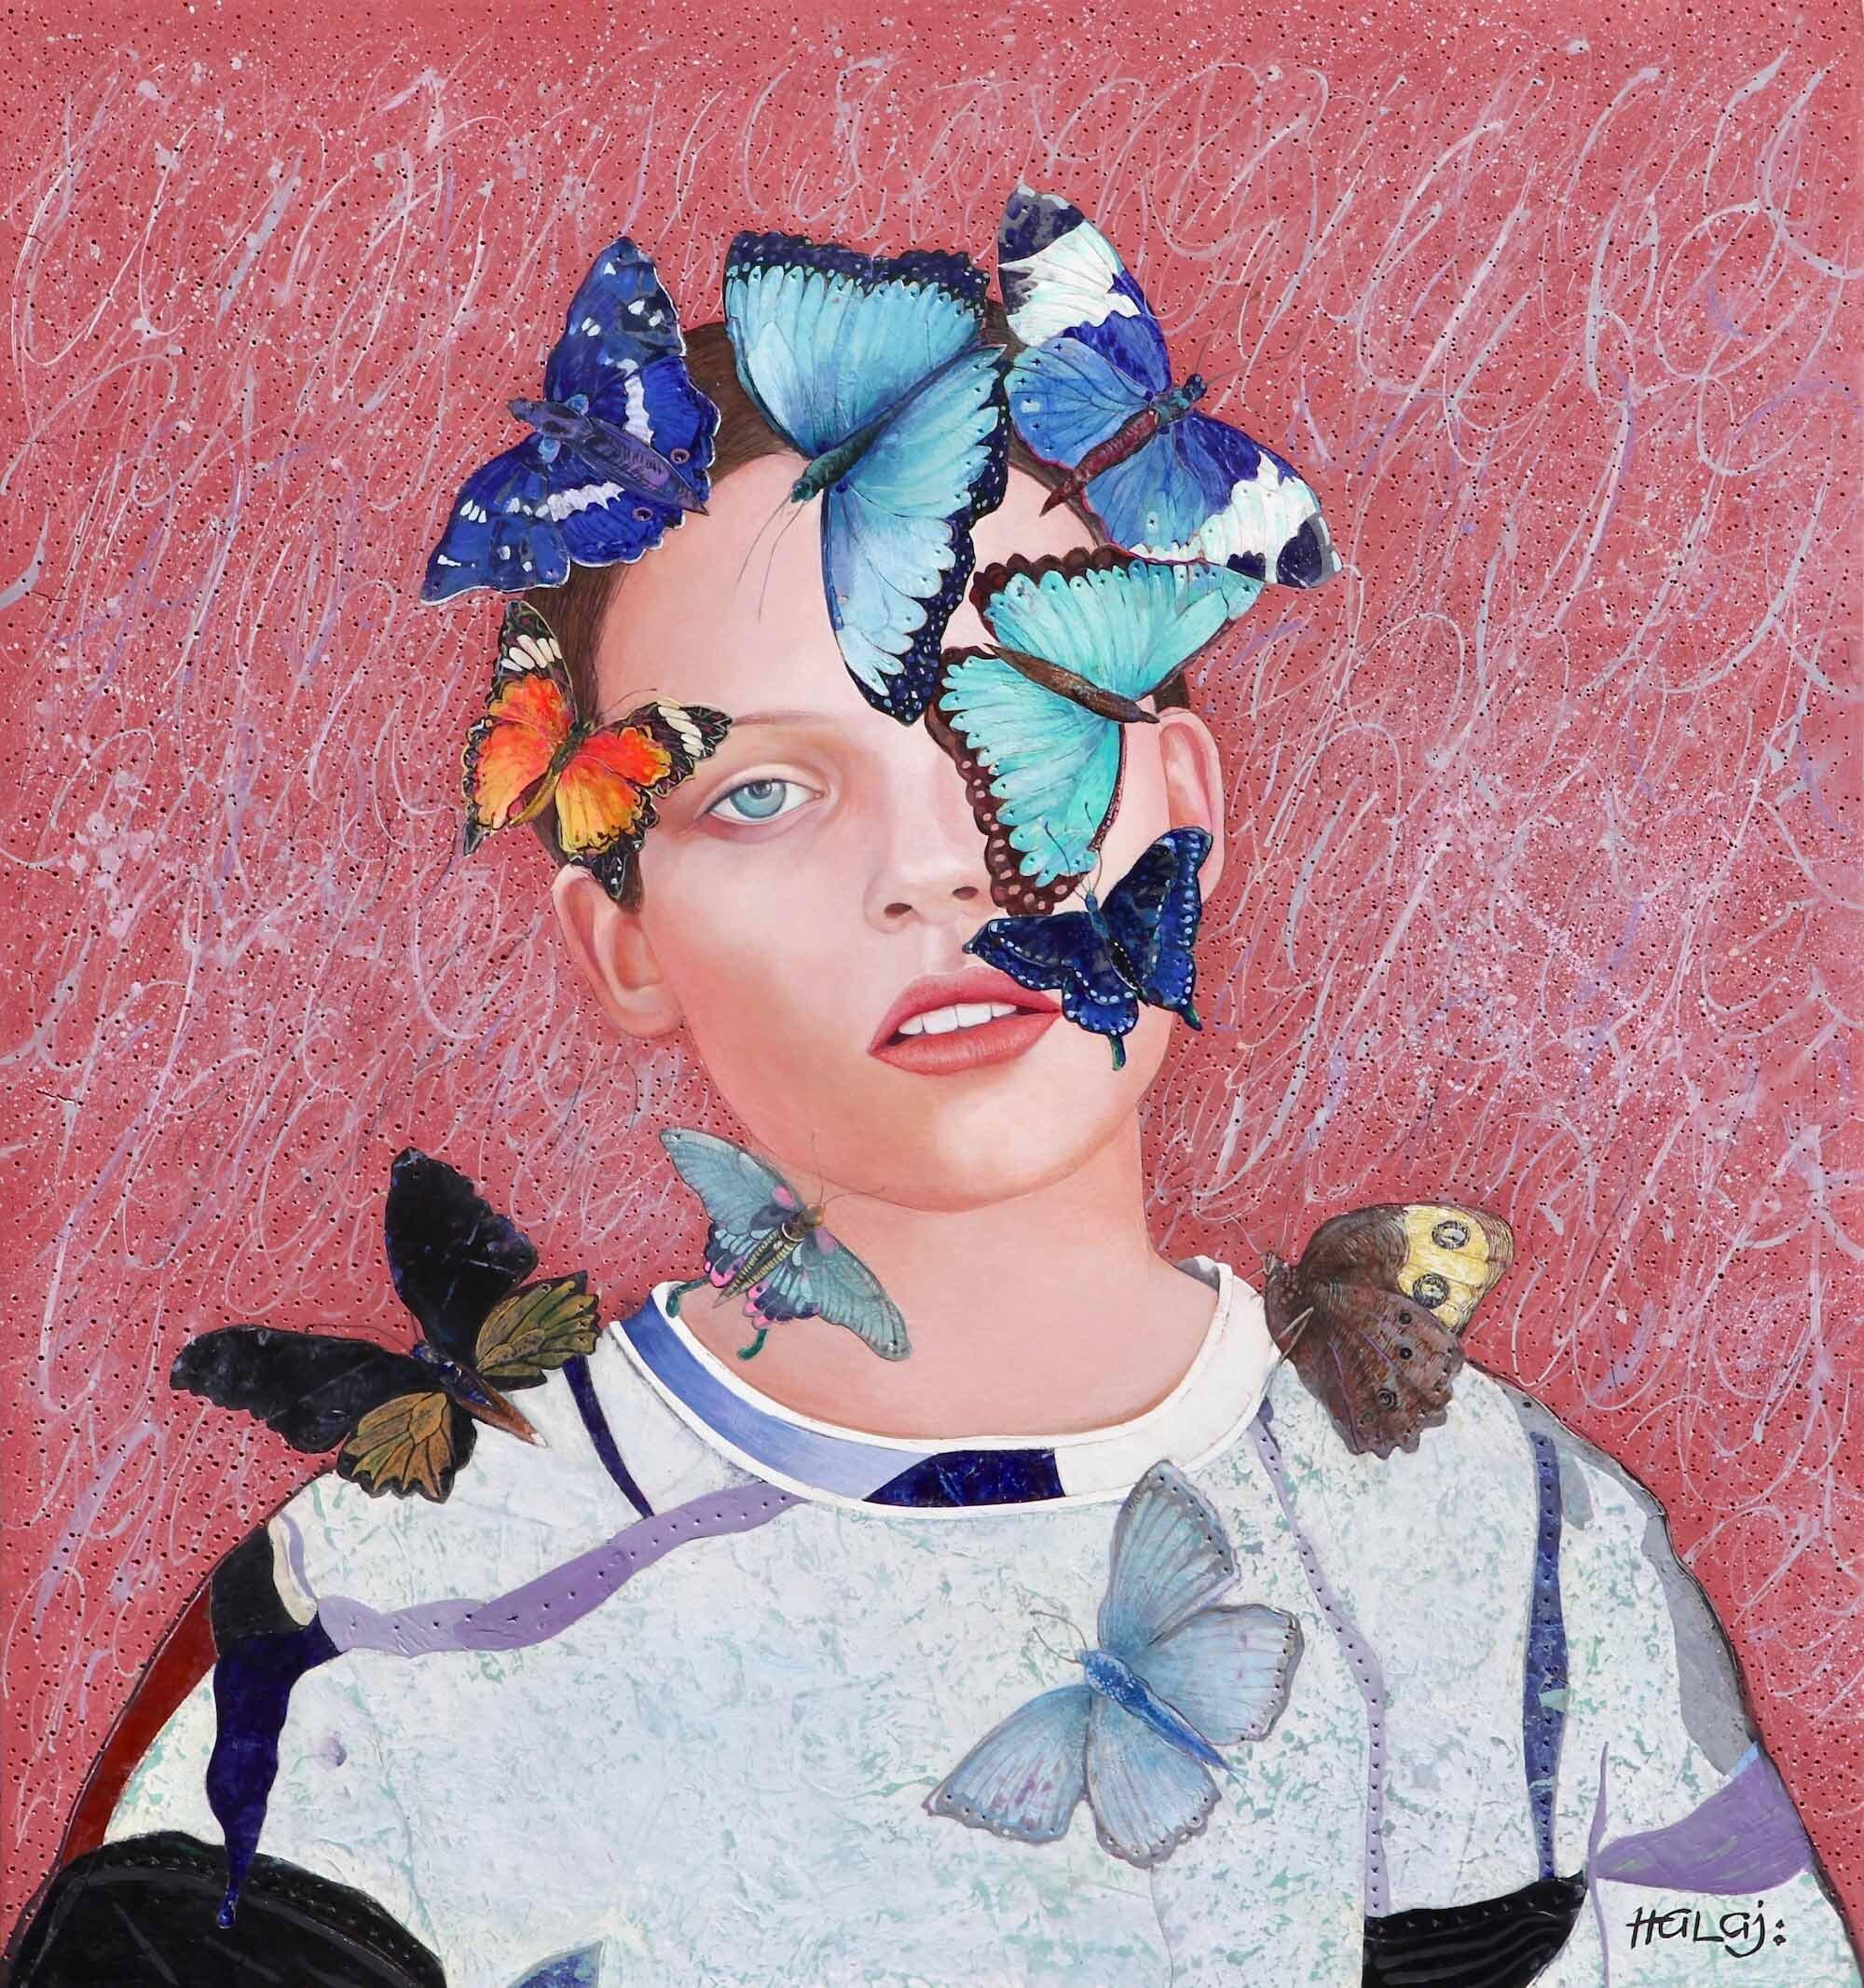 "Minas Halaj  "" Butterfly # 4 "" 2019, Oil, Mixed Media On Panel, 30x28 inches, (76.2x 71.12 cm.).jpg"